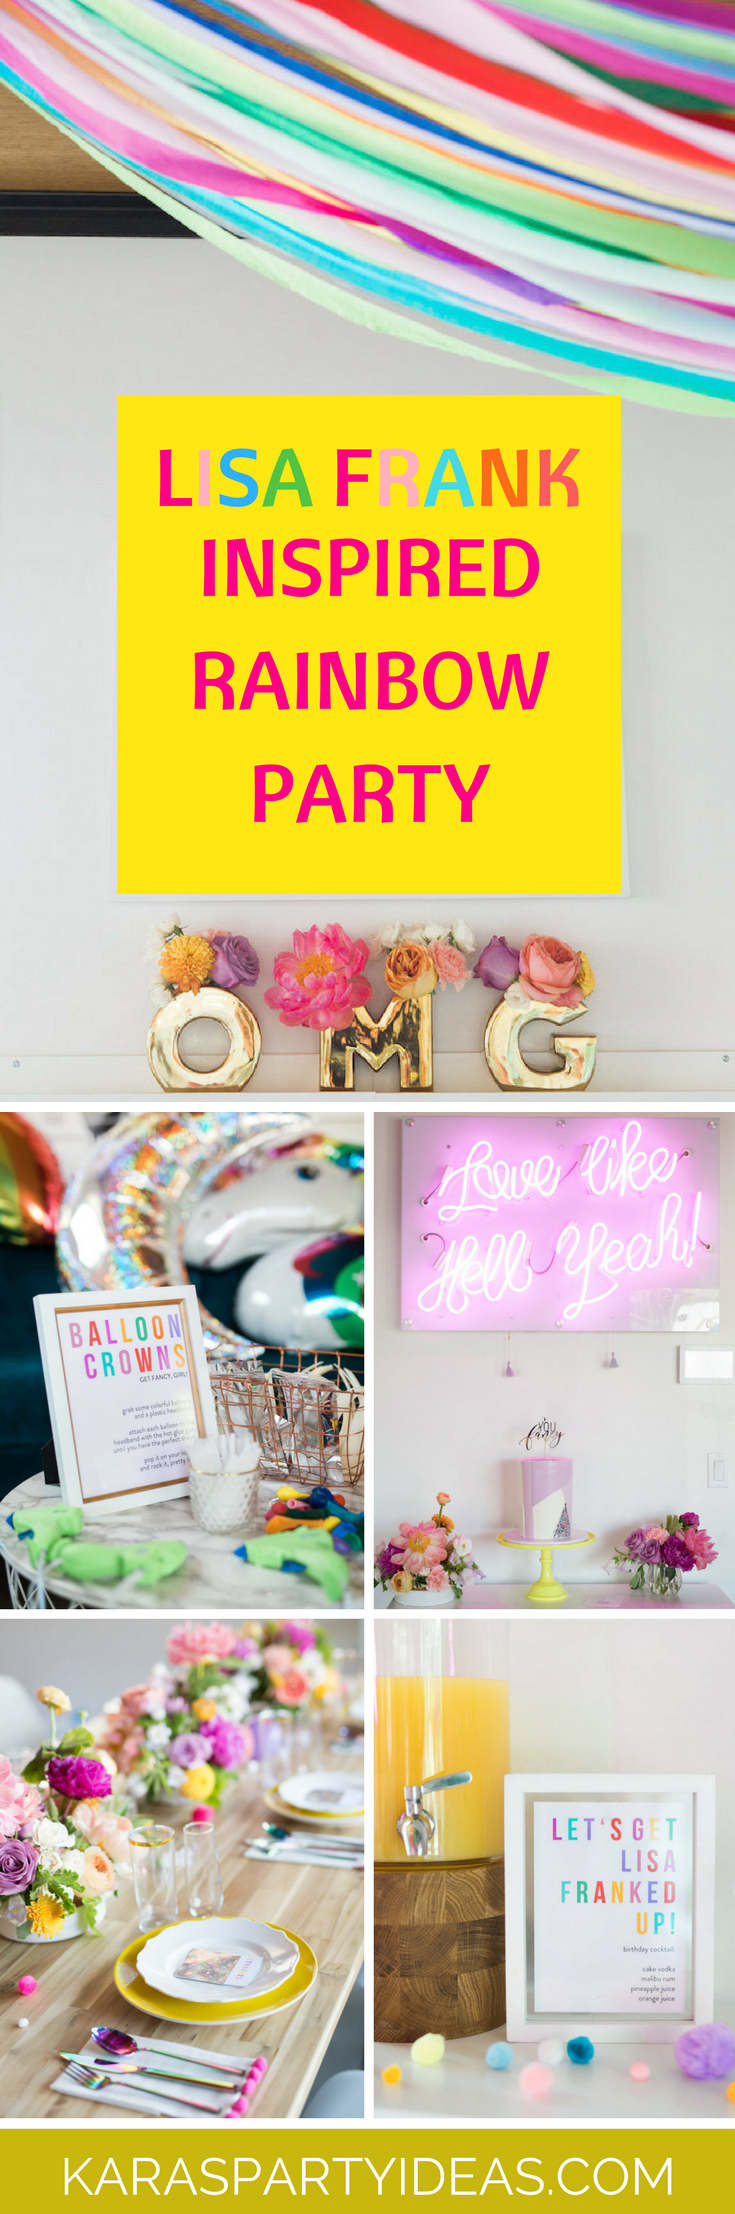 Lisa Frank Inspired Rainbow Party via Kara's Party Ideas - KarasPartyIdeas.com